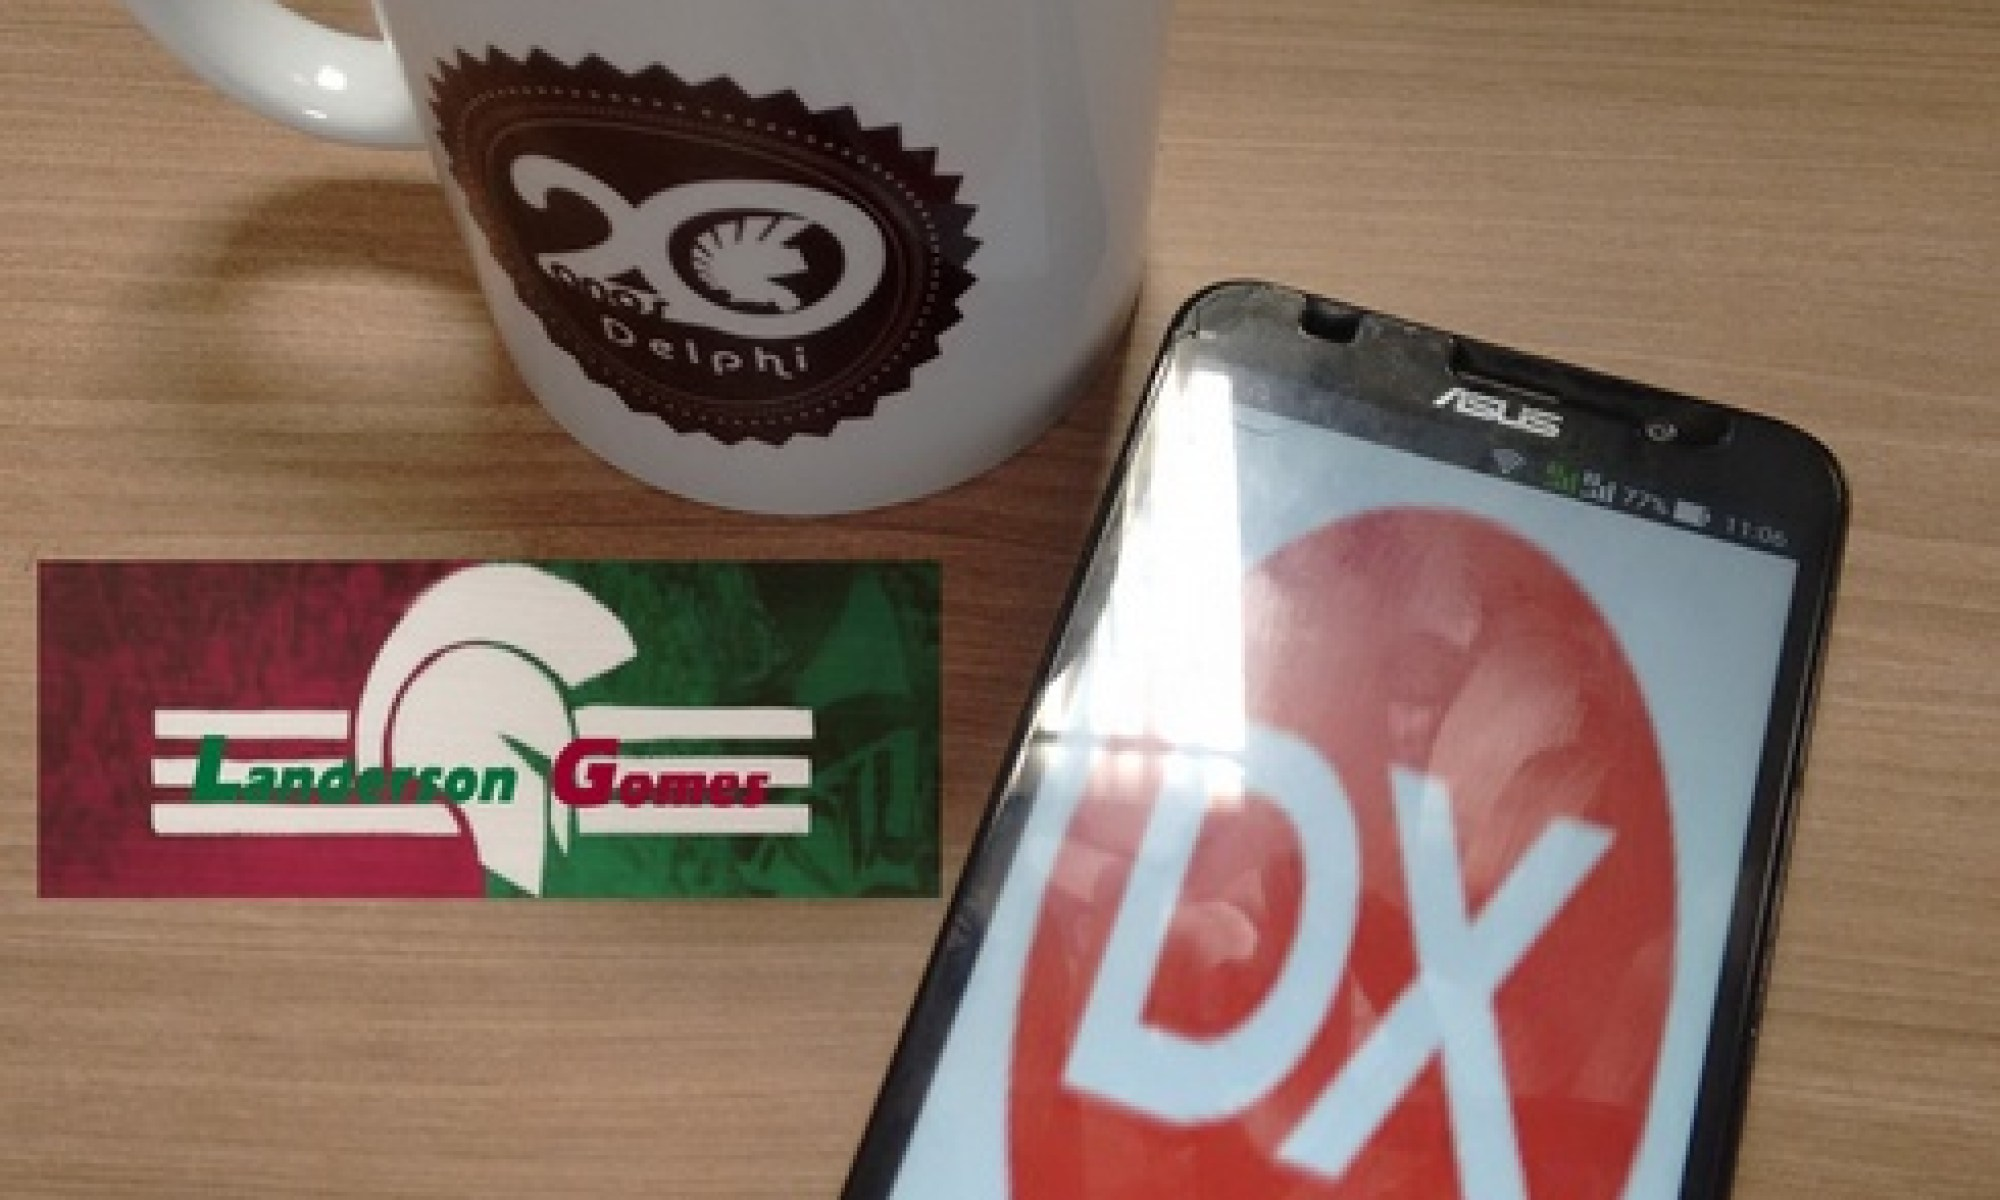 Zen Fone 2 - Rodando Delphi Android